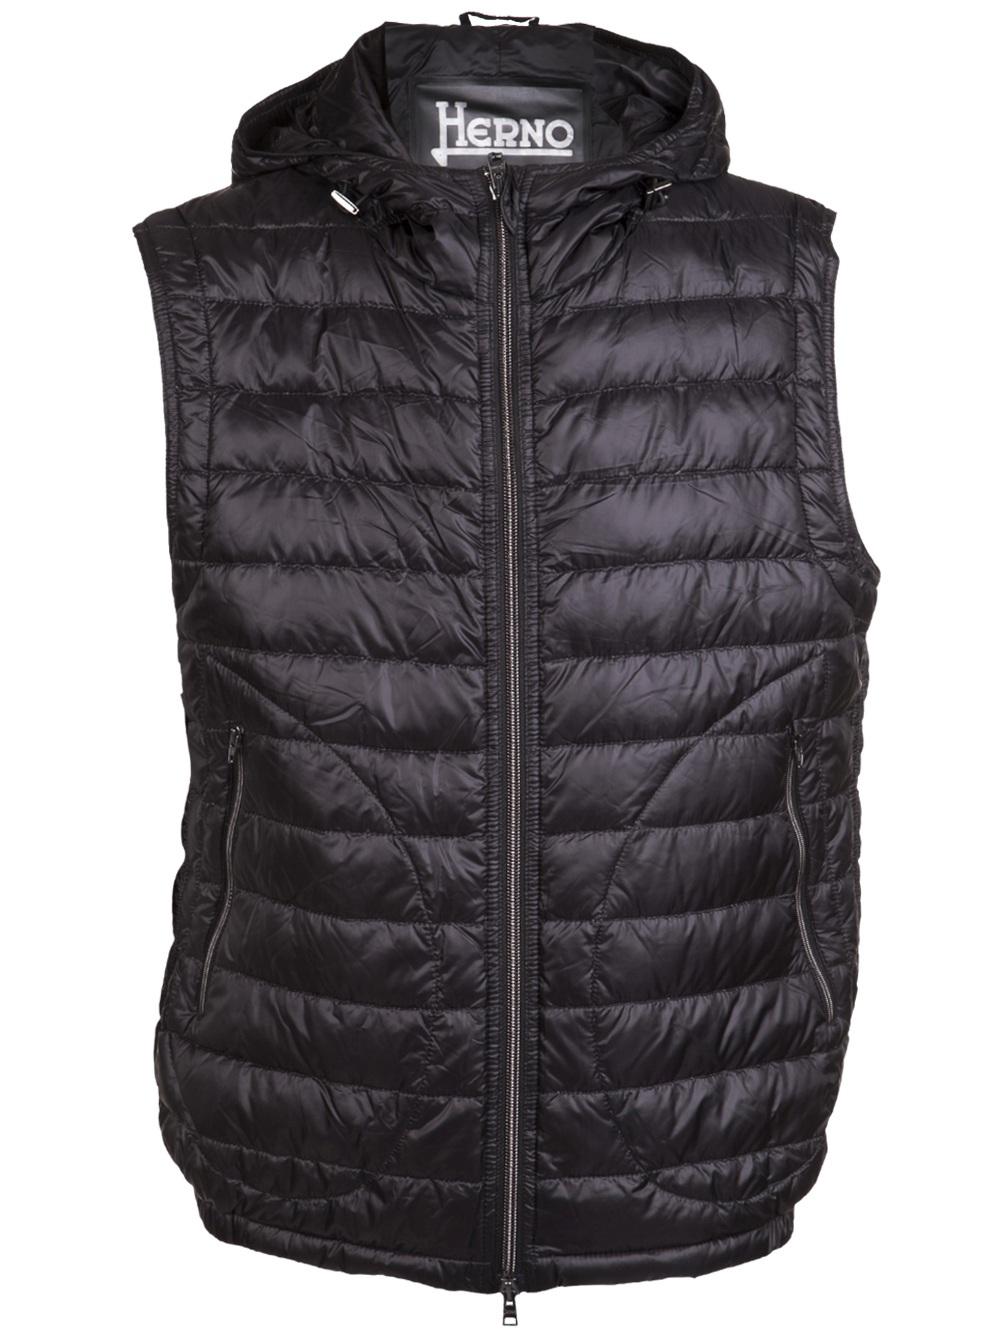 Find great deals on eBay for mens black hooded vest. Shop with confidence.